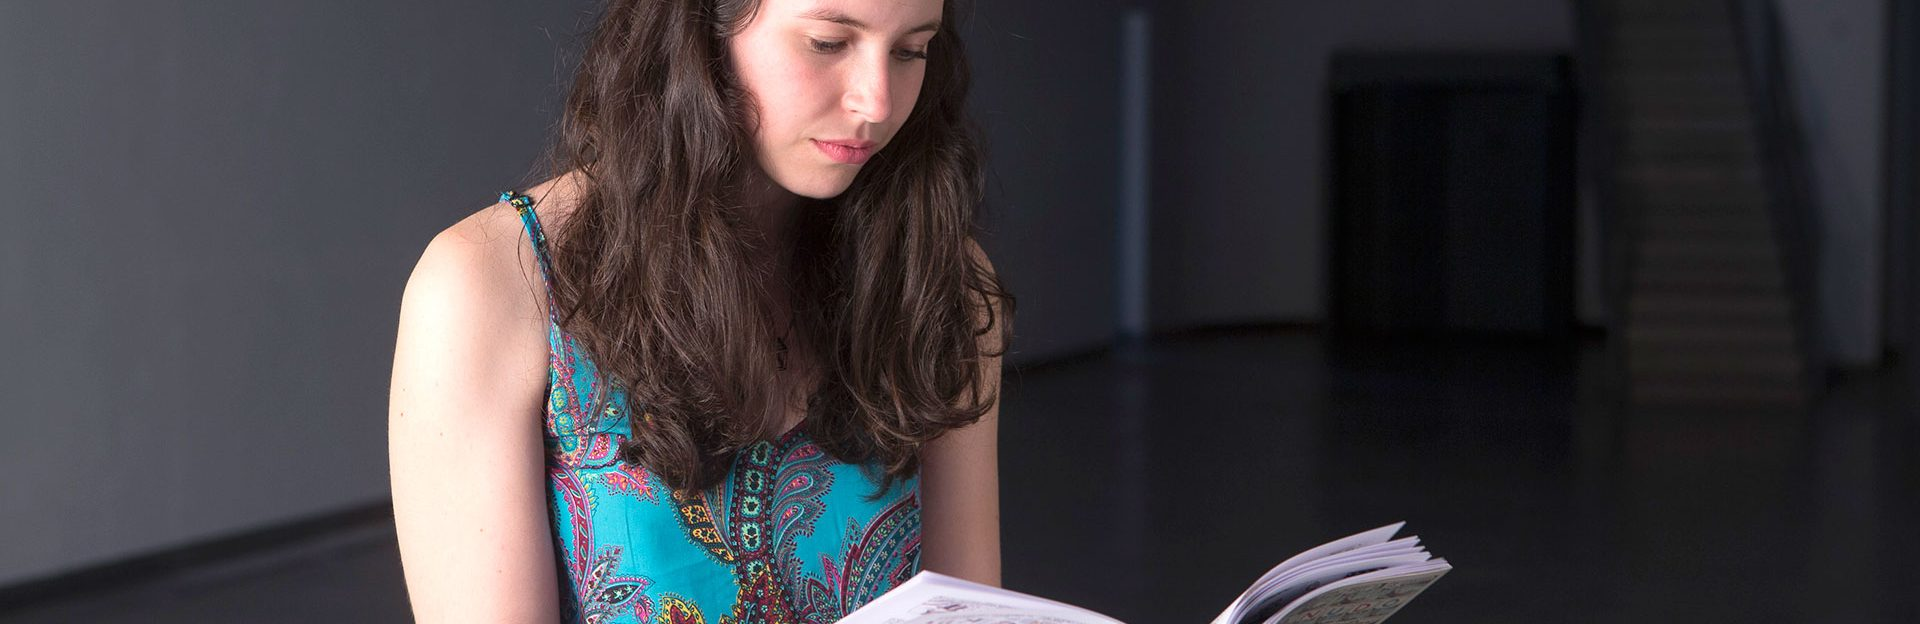 chica_leyendo